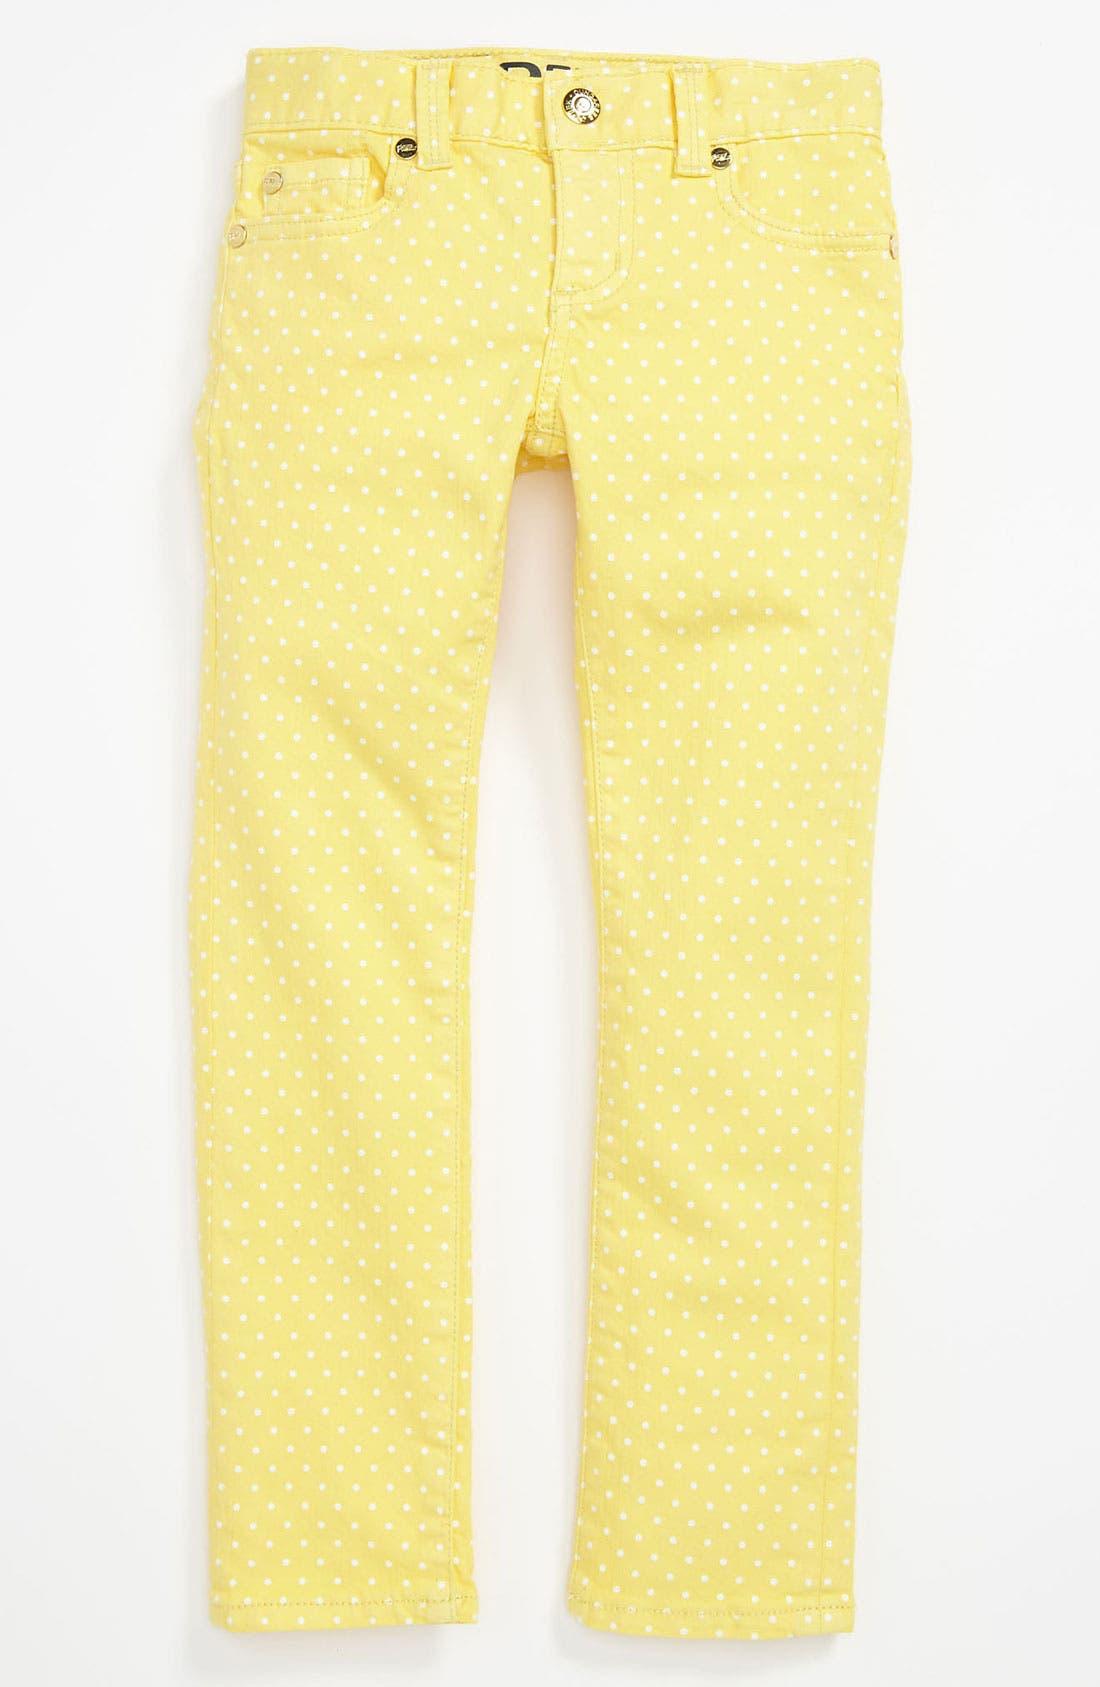 Alternate Image 2  - Peek 'Audrey' Jeans (Toddler, Little Girls & Big Girls)